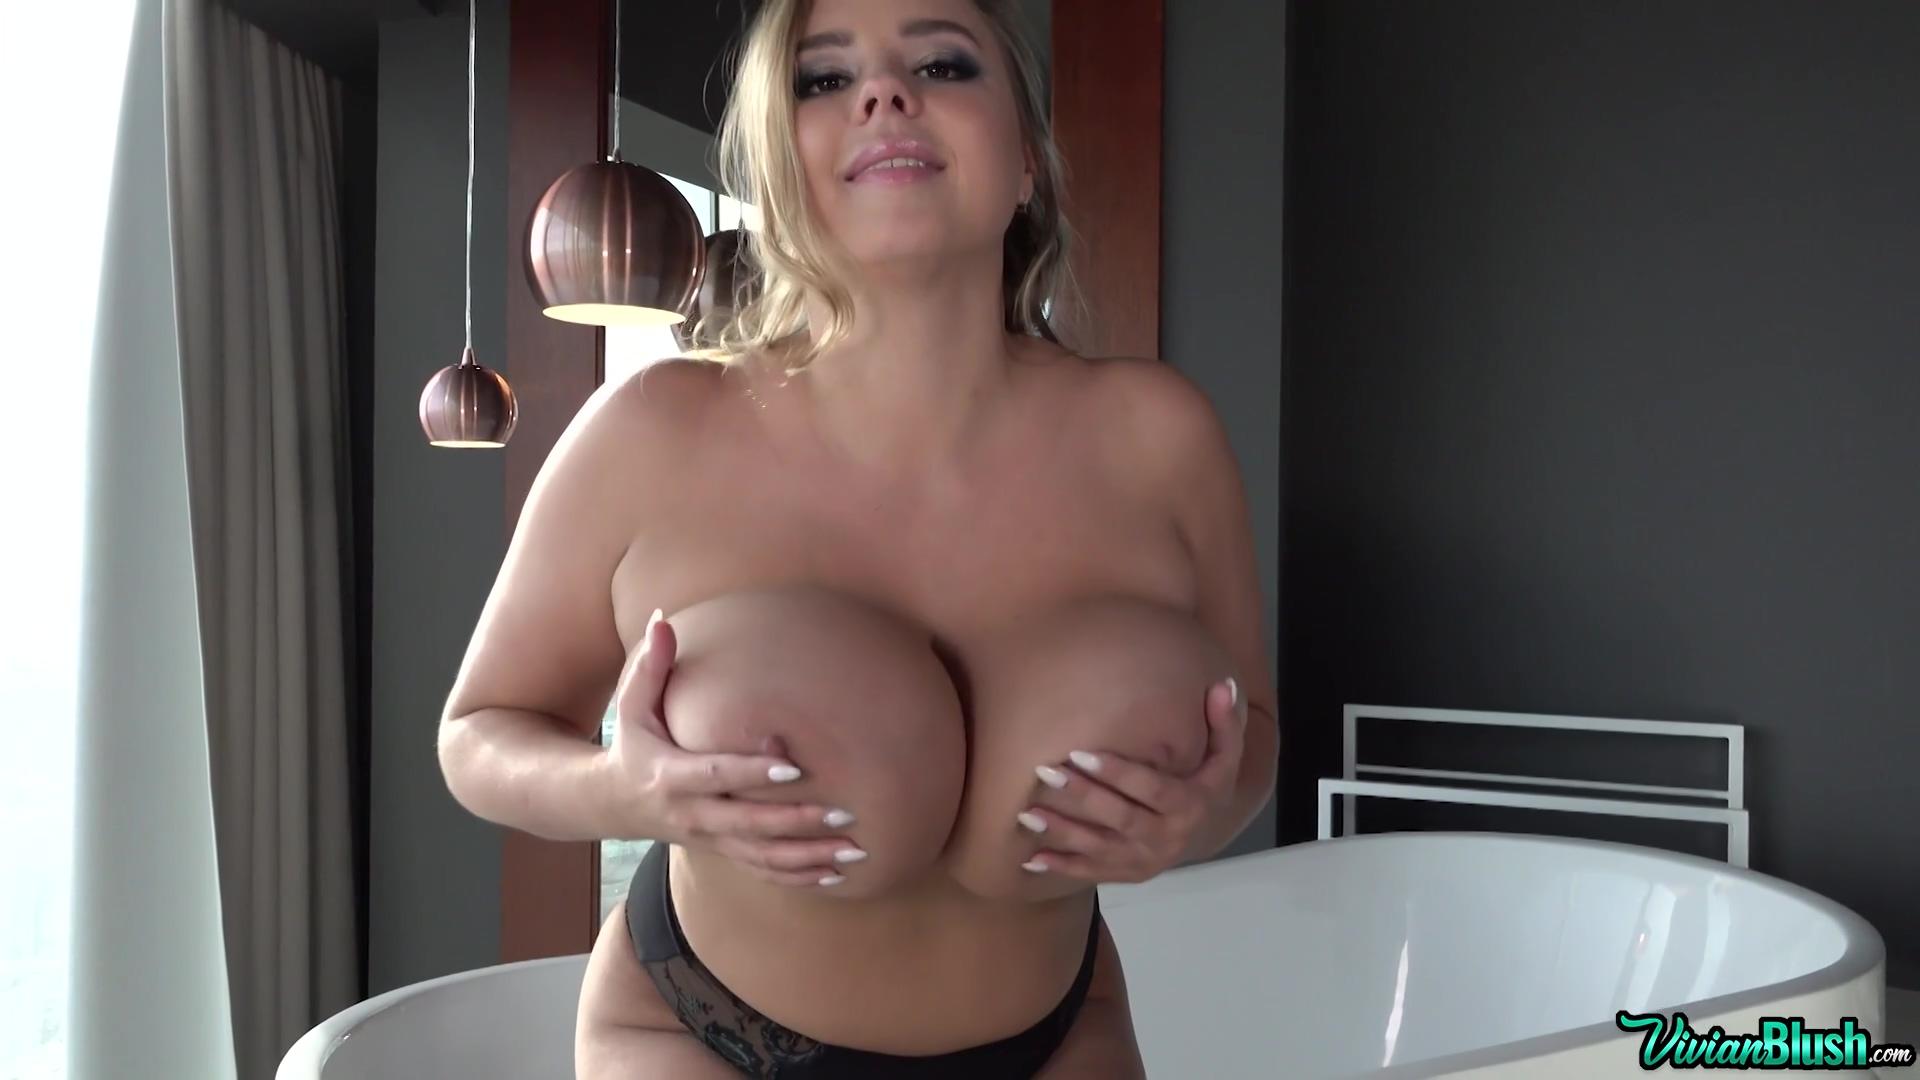 Undress Me And Stare 1080p - Vivian Blush